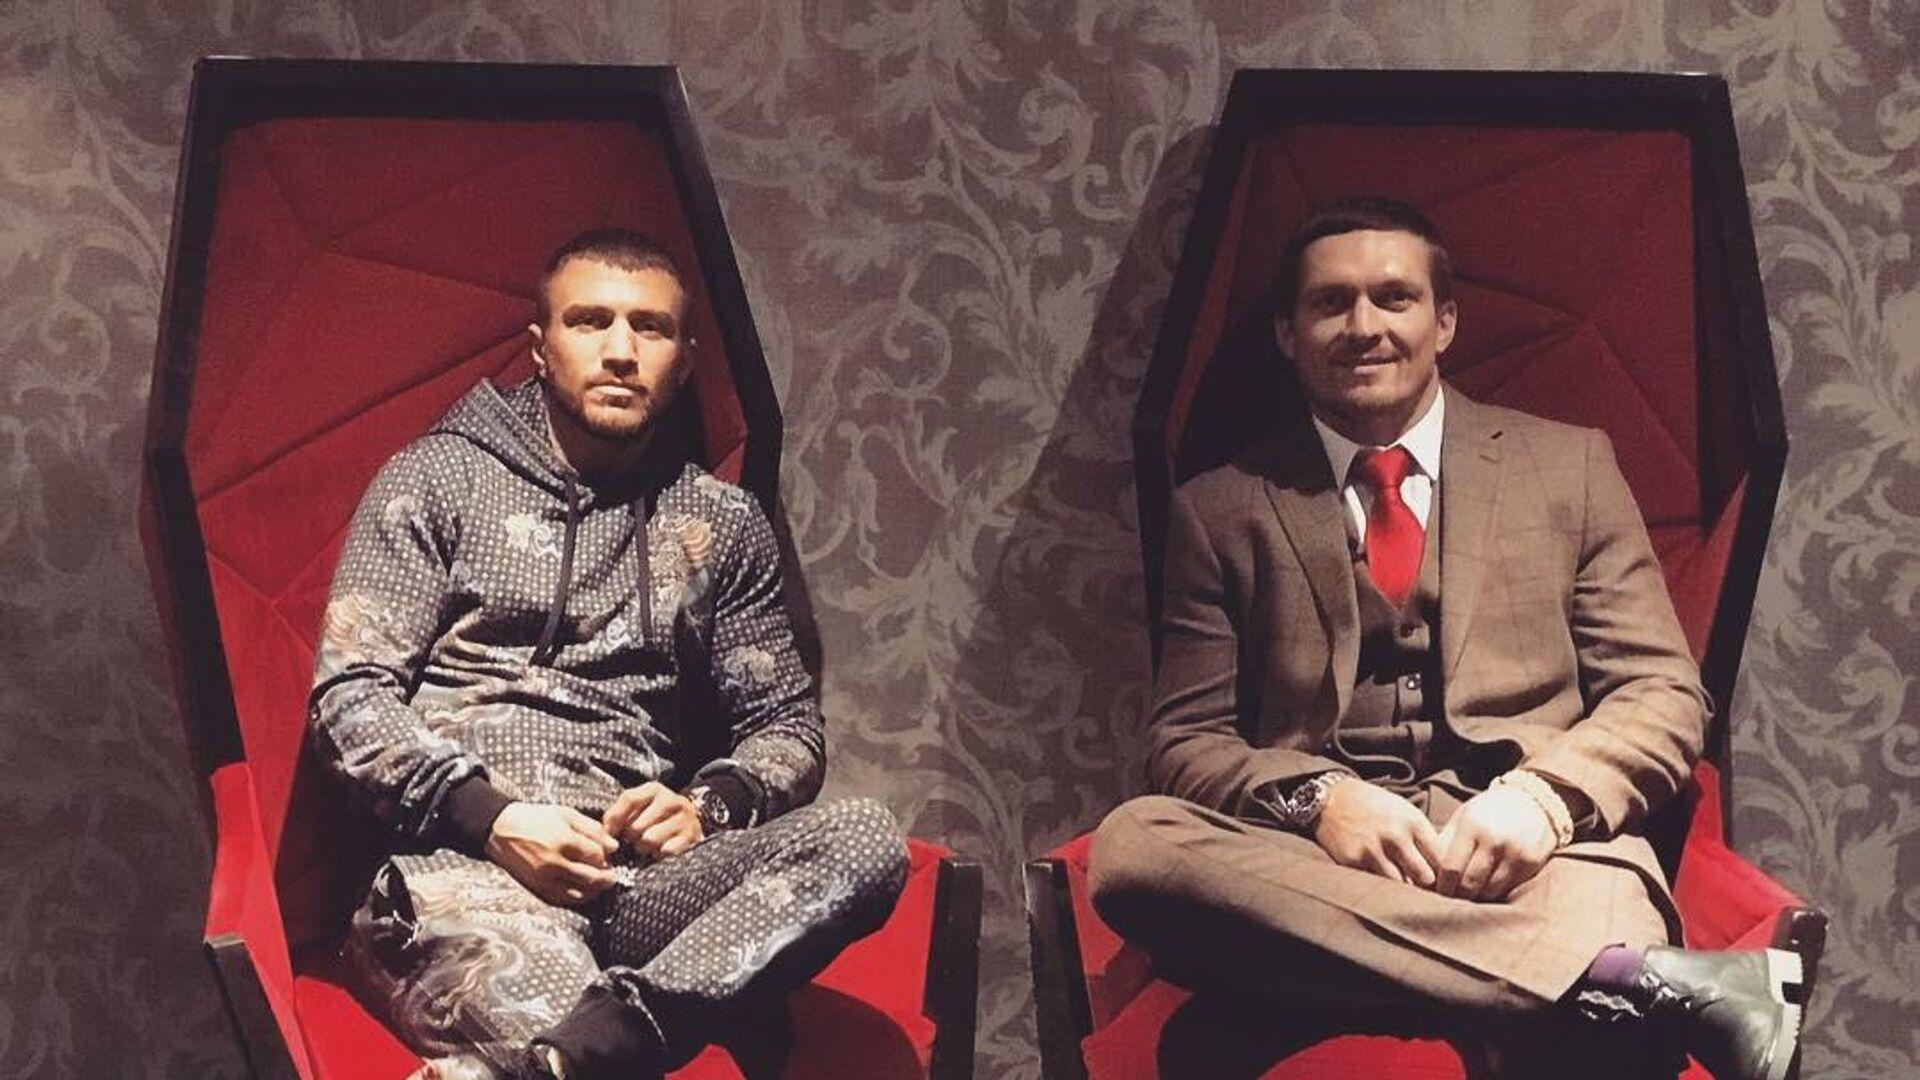 Василий Ломаченко и Александр Усик - РИА Новости, 1920, 07.05.2020